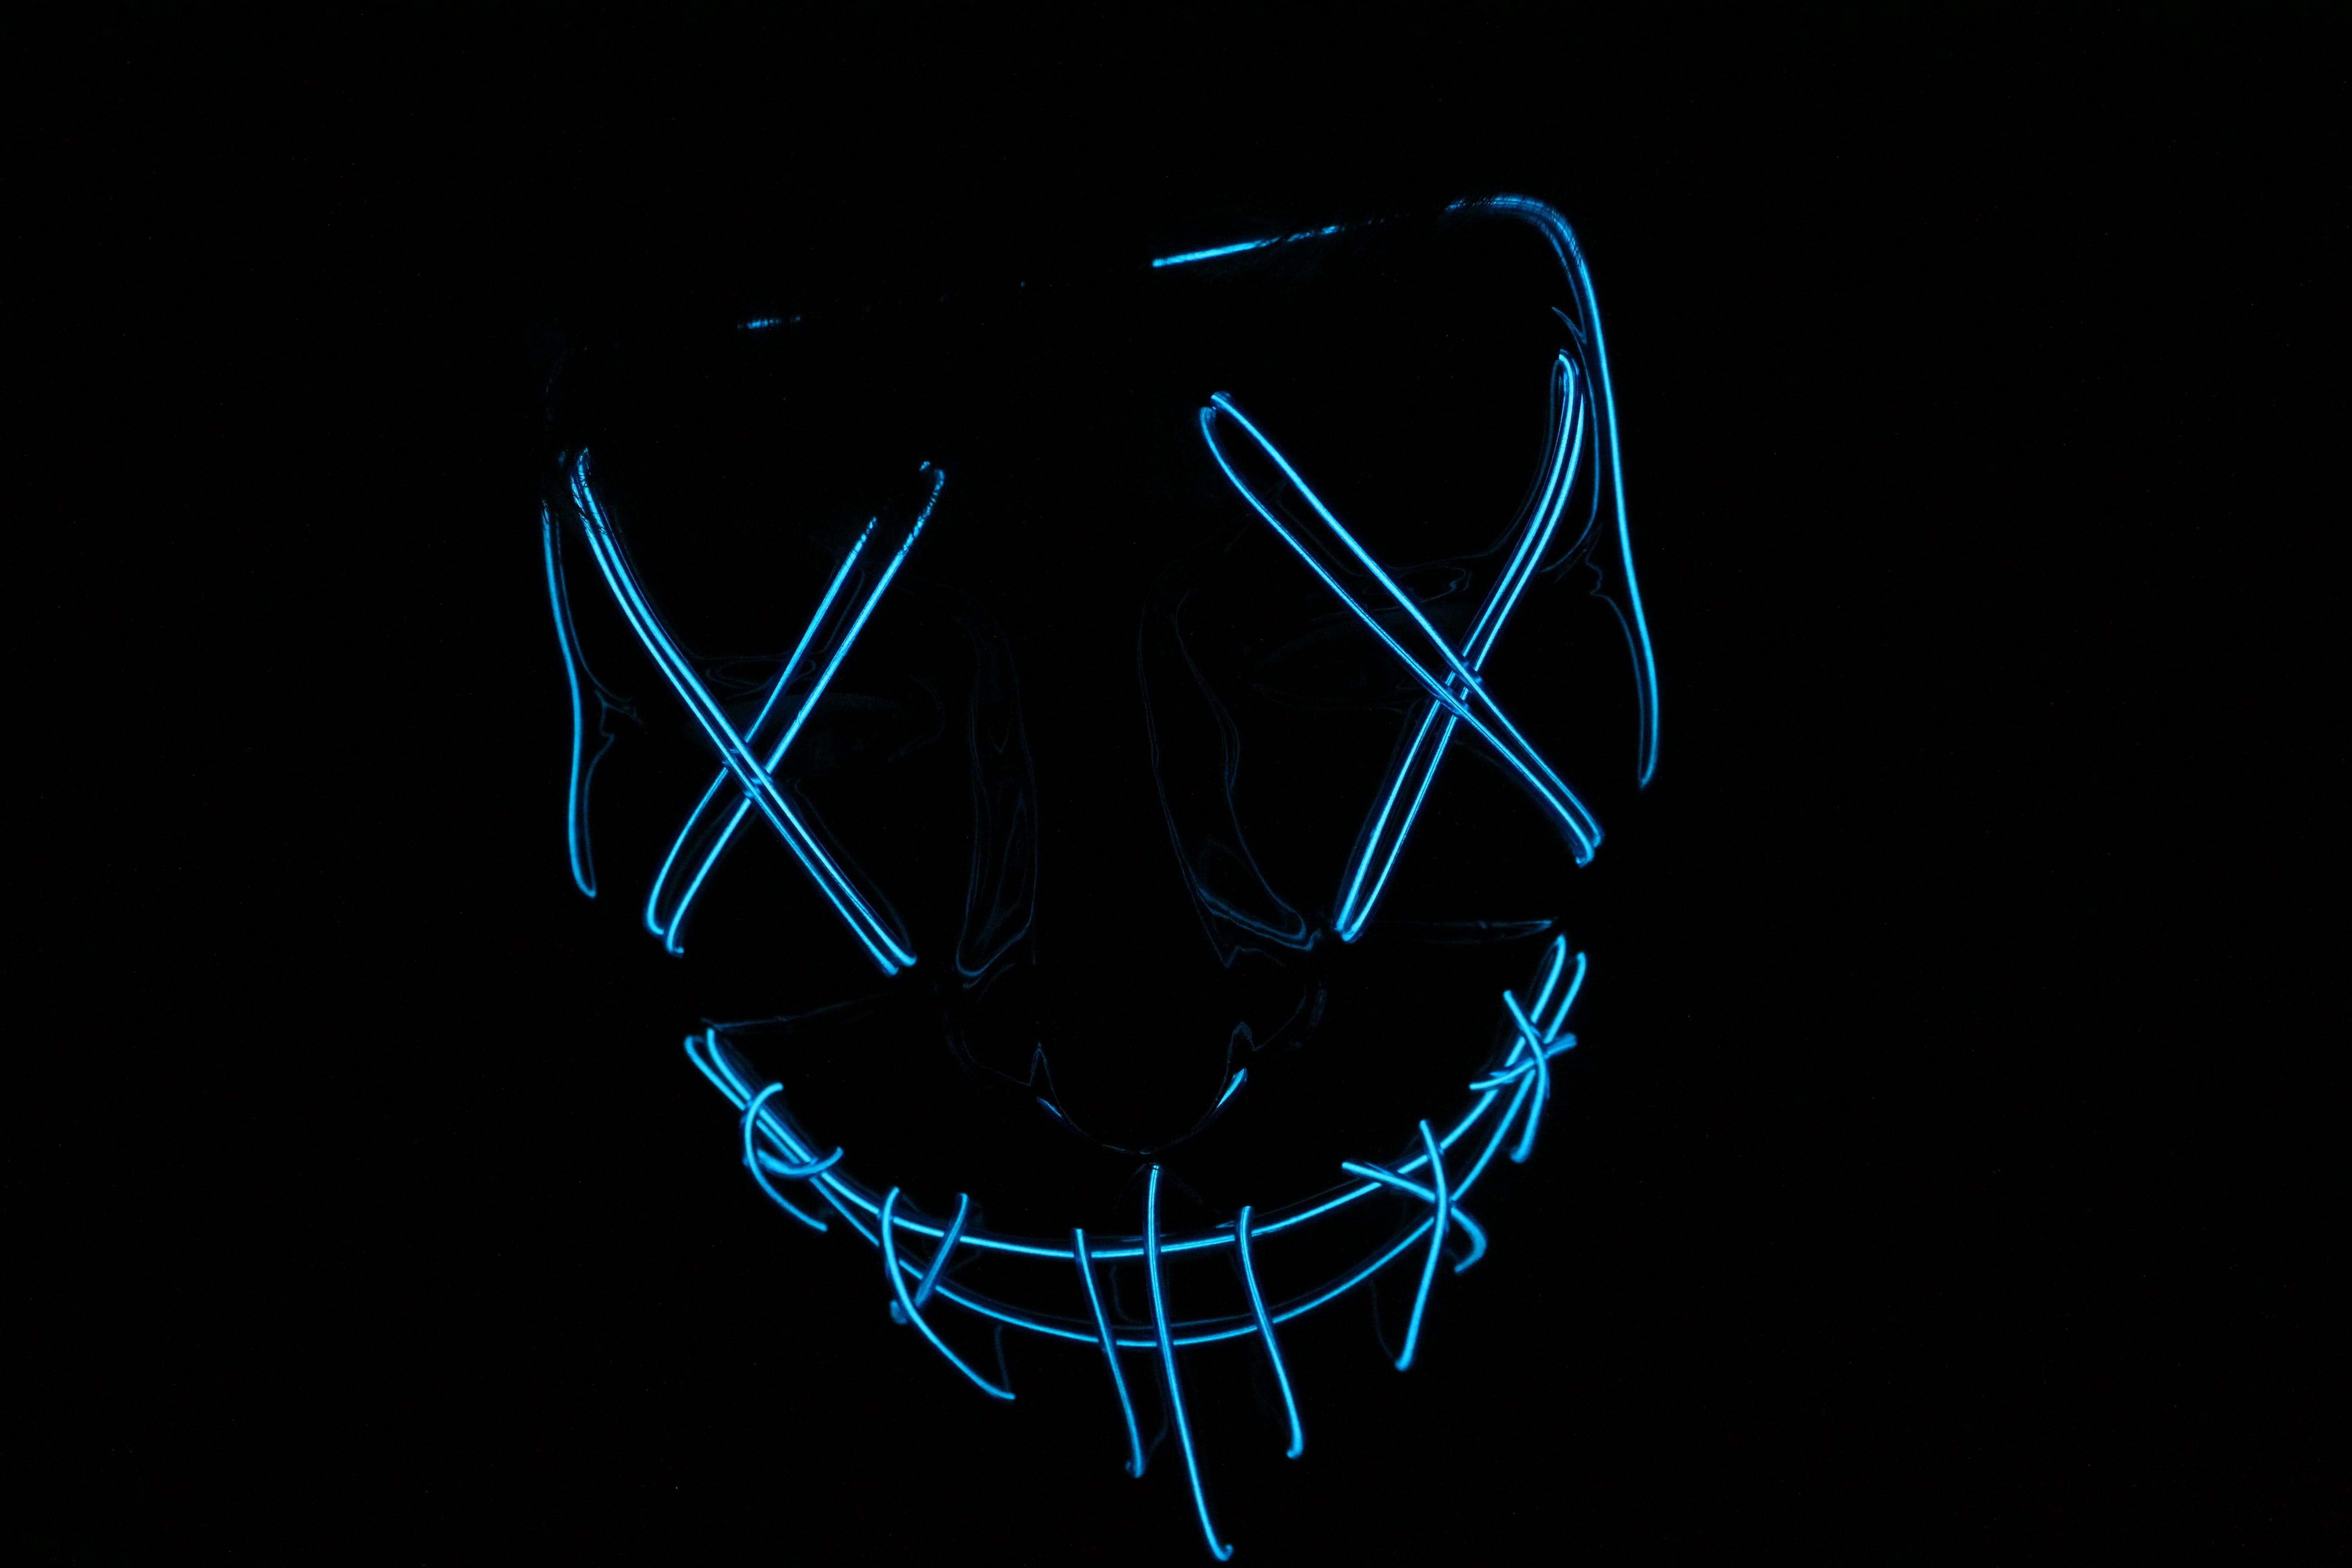 Blue-light Skull Signage